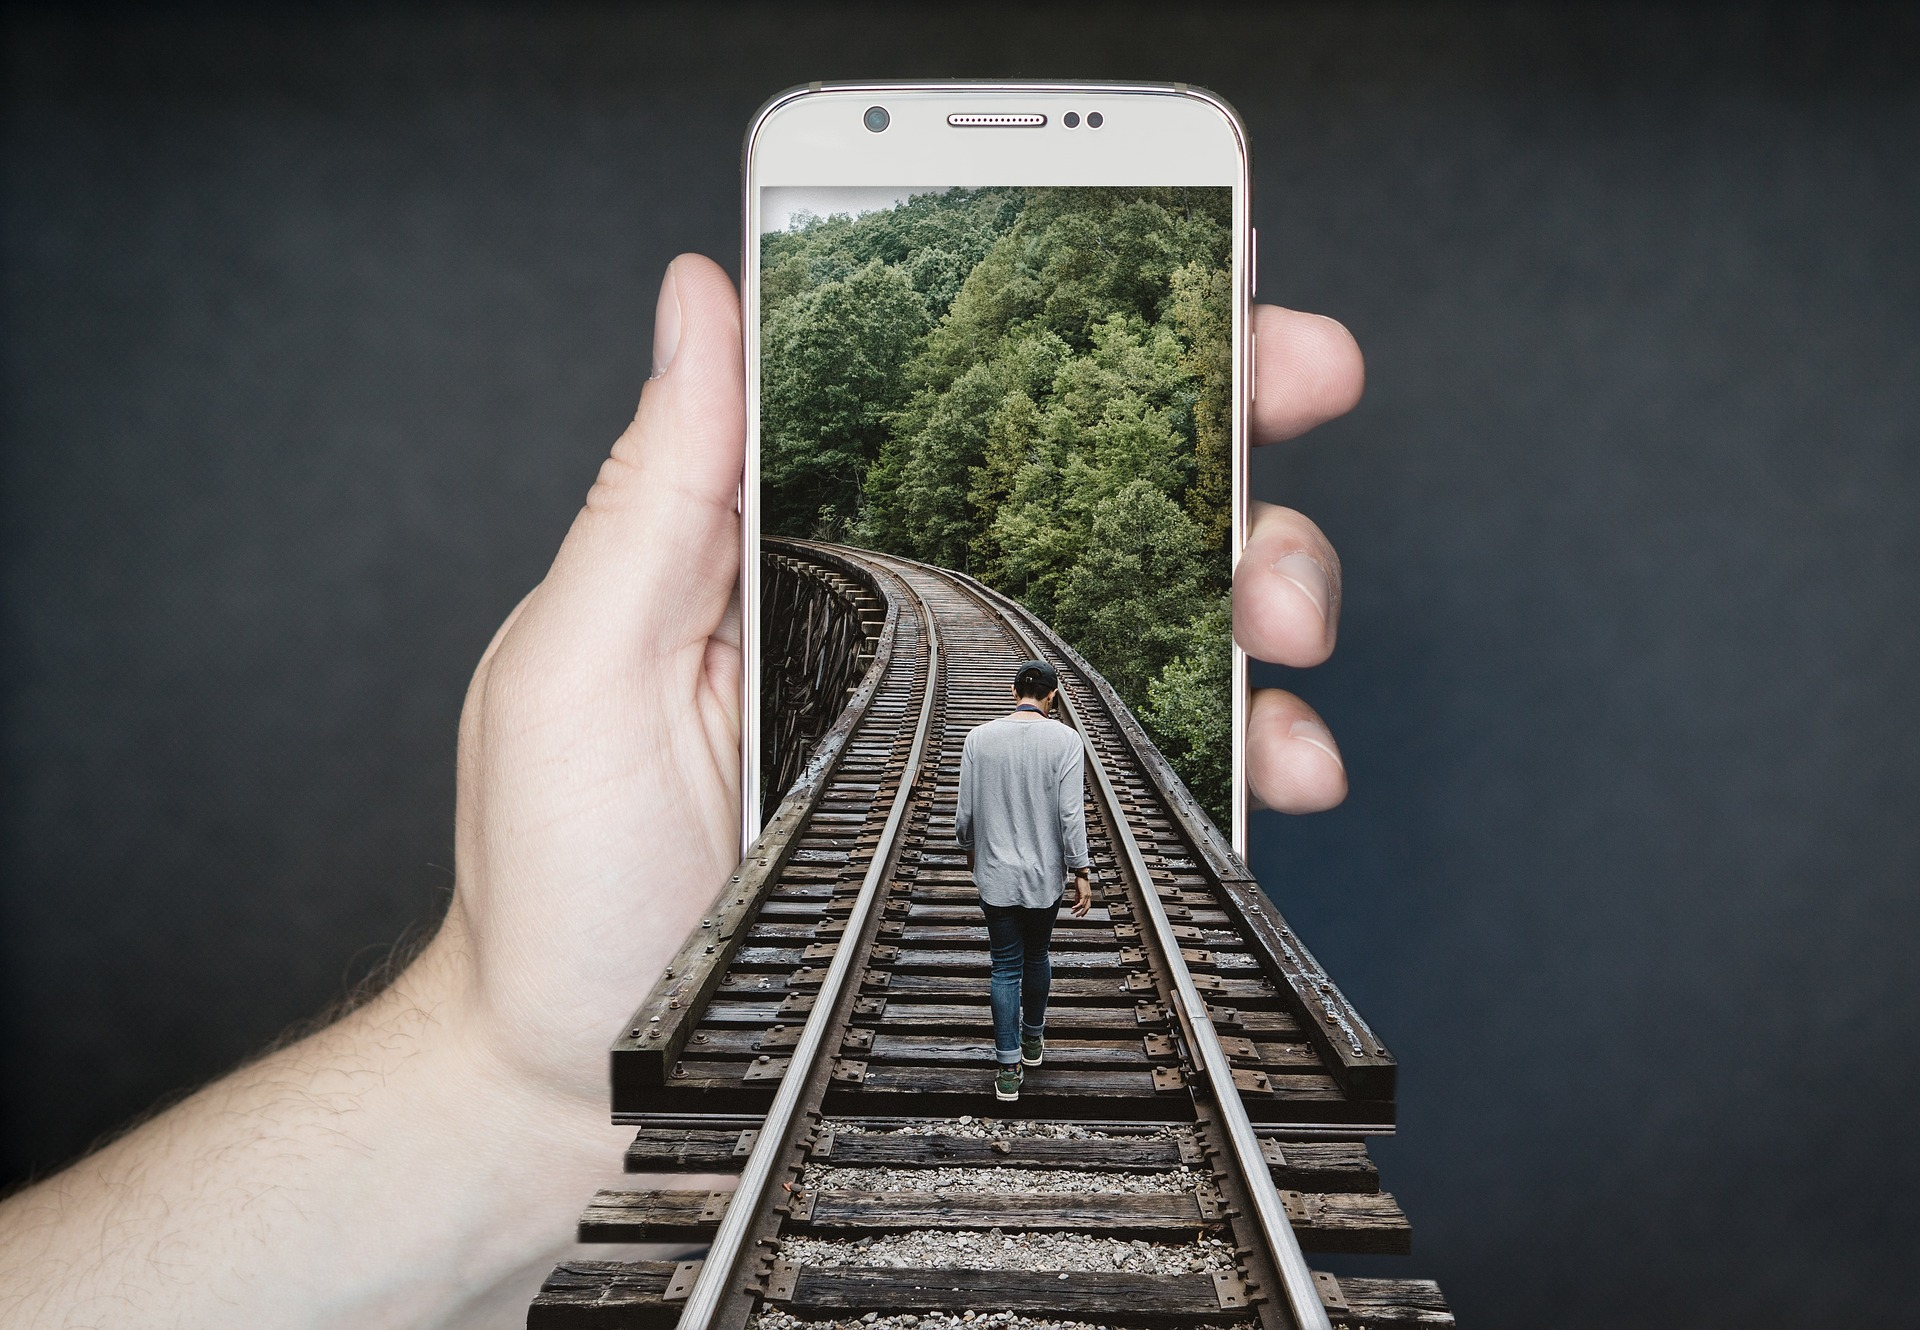 Un comble: l'antivirus des smartphones Xiaomi vulnérable à des cyberattaques mobiles